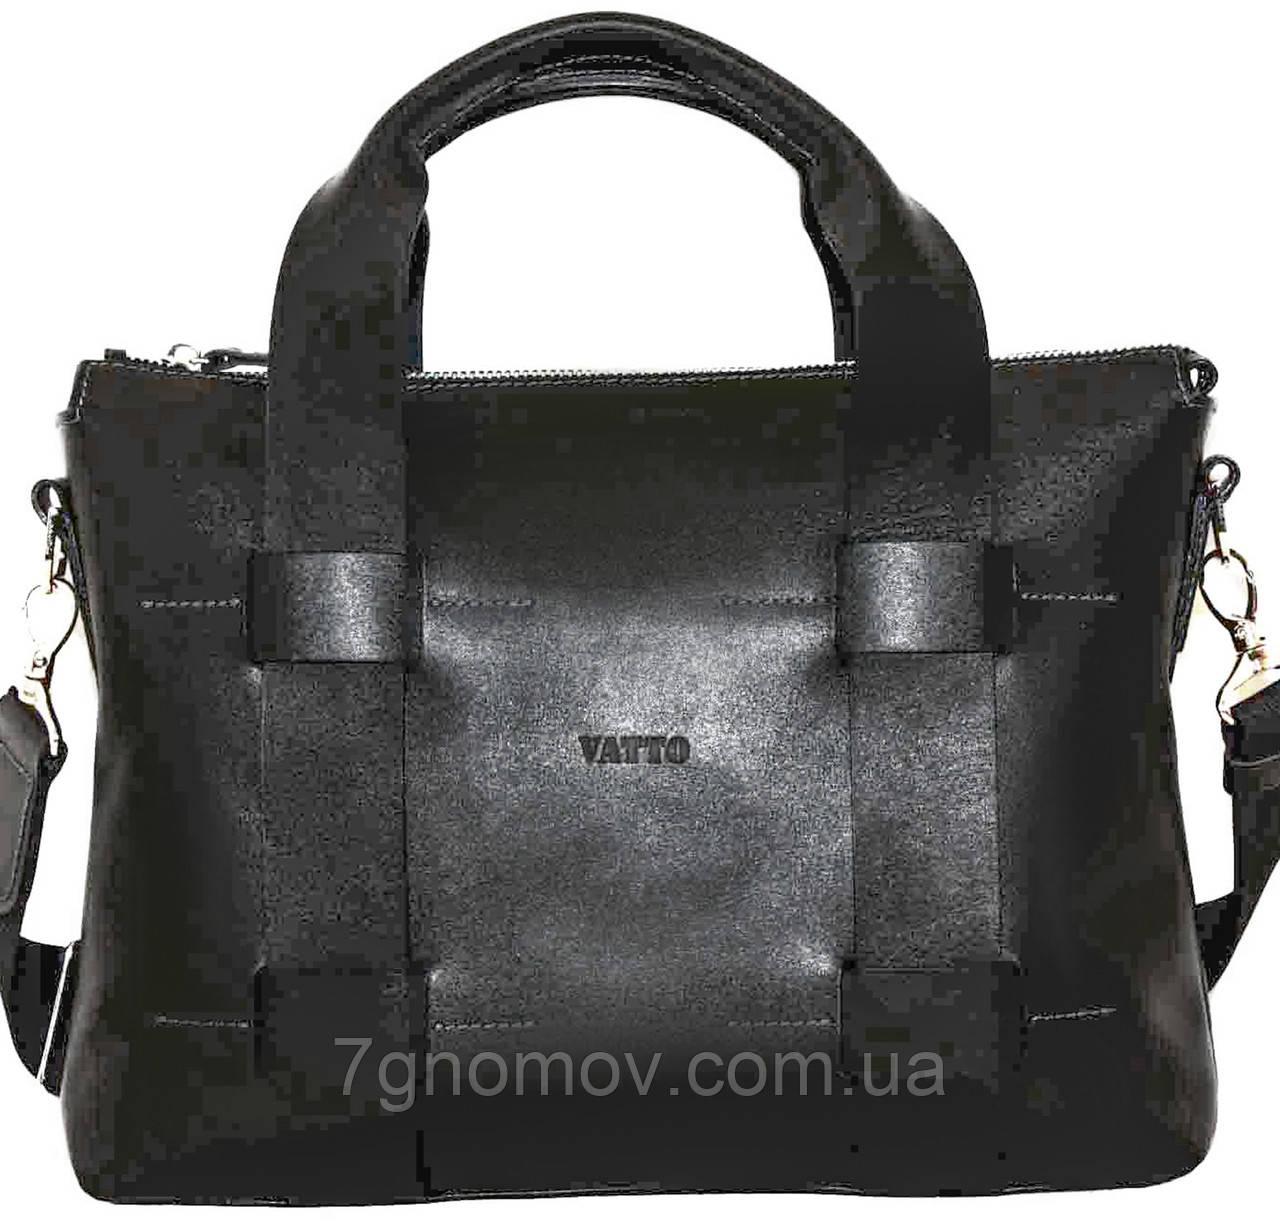 Мужская сумка VATTO Mk23 Kaz1